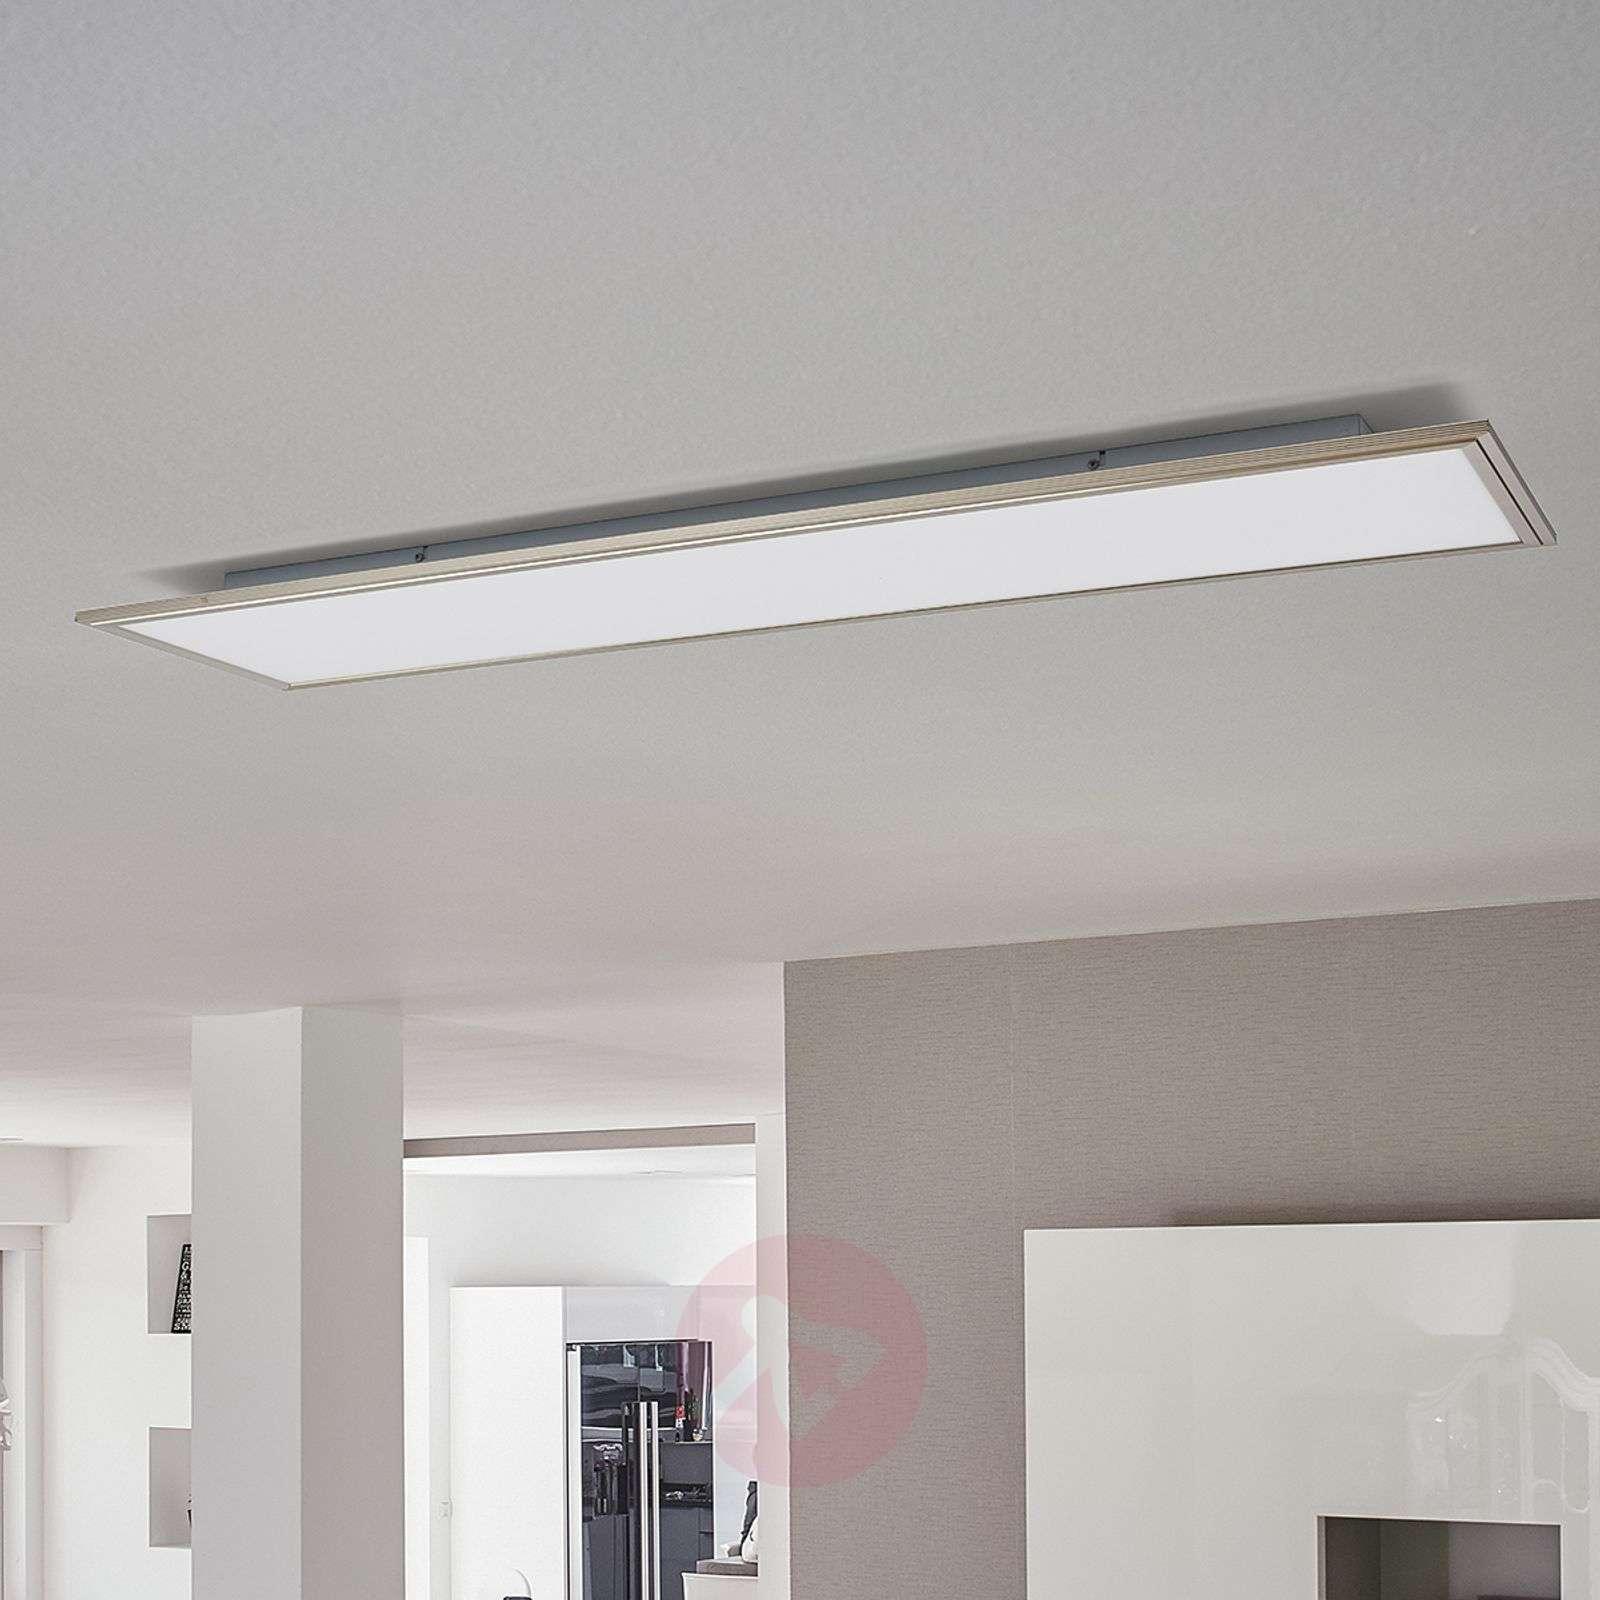 Corinna LED ceiling light 2700 6200K 120 x 30 cm-1558152-04